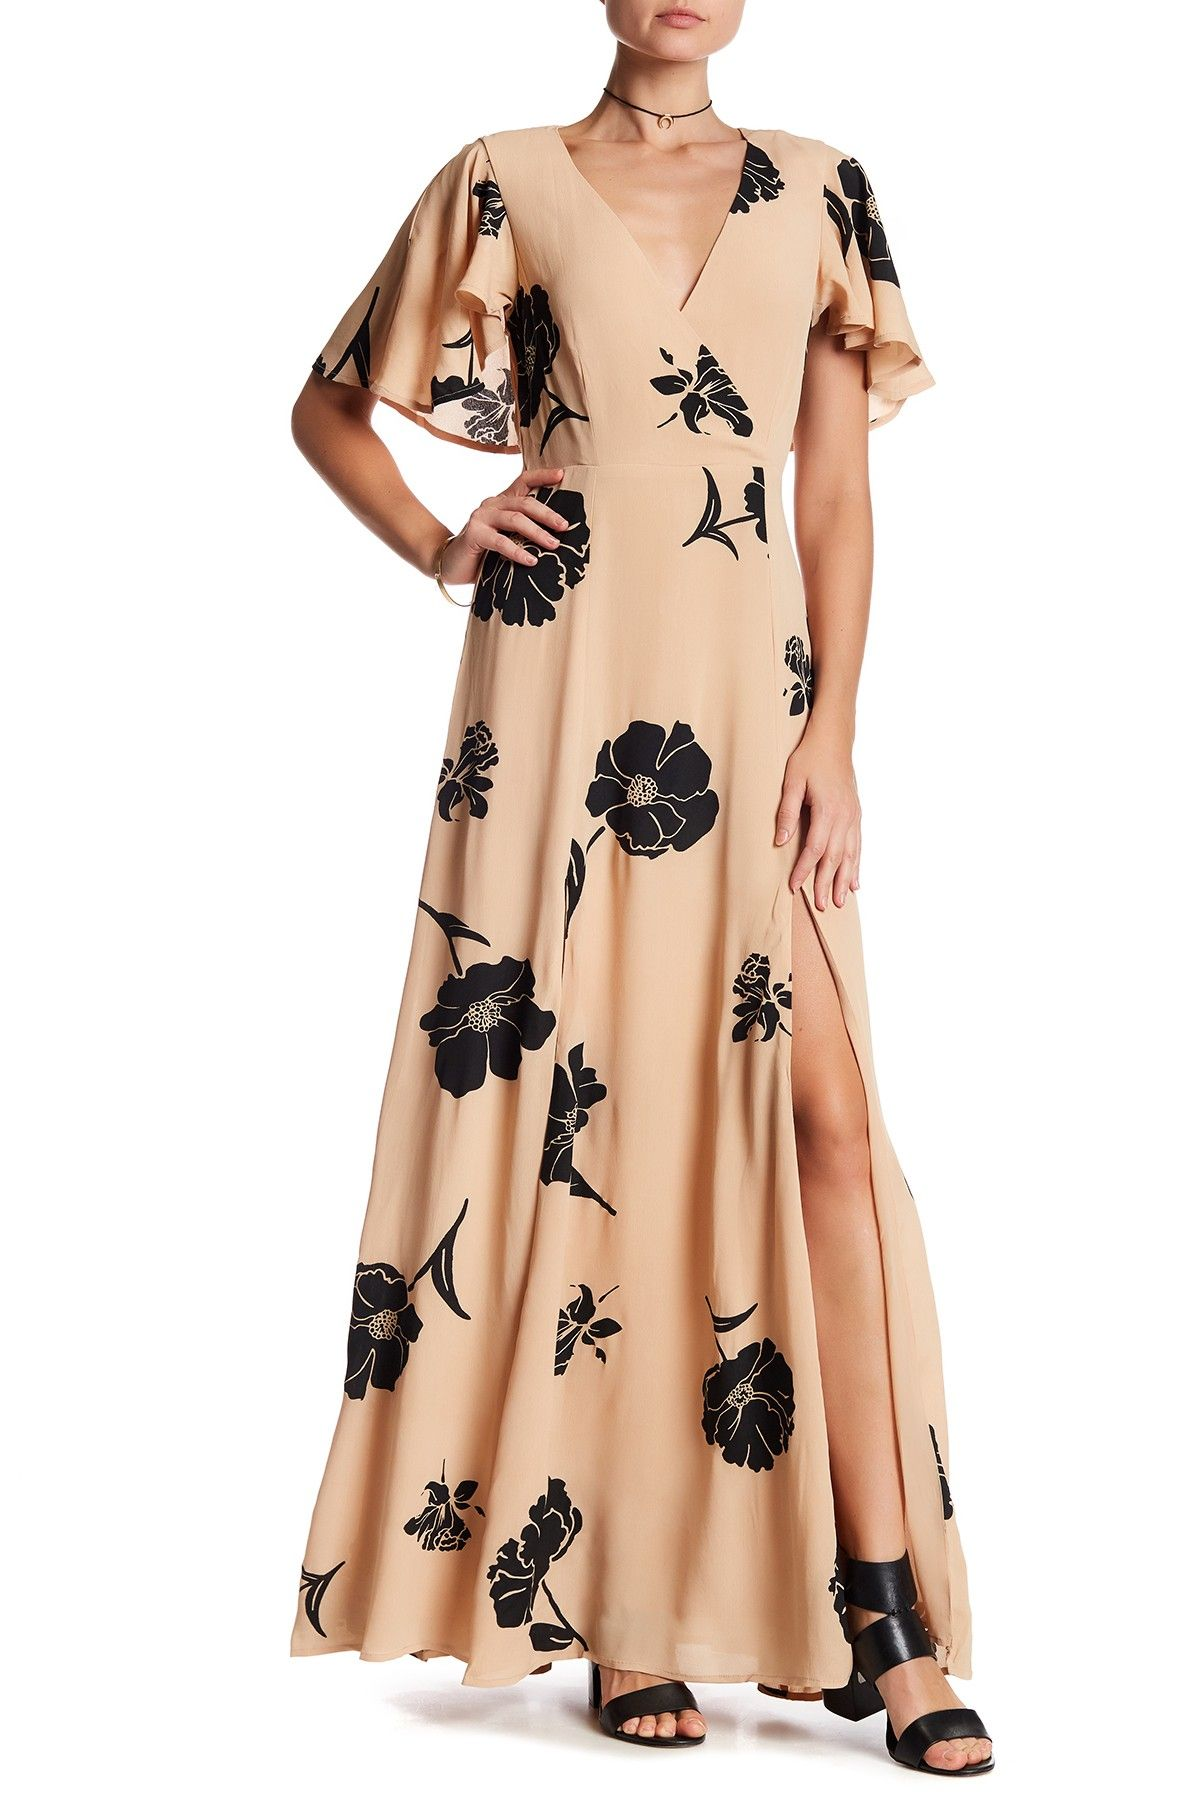 Moni Maxi Dress